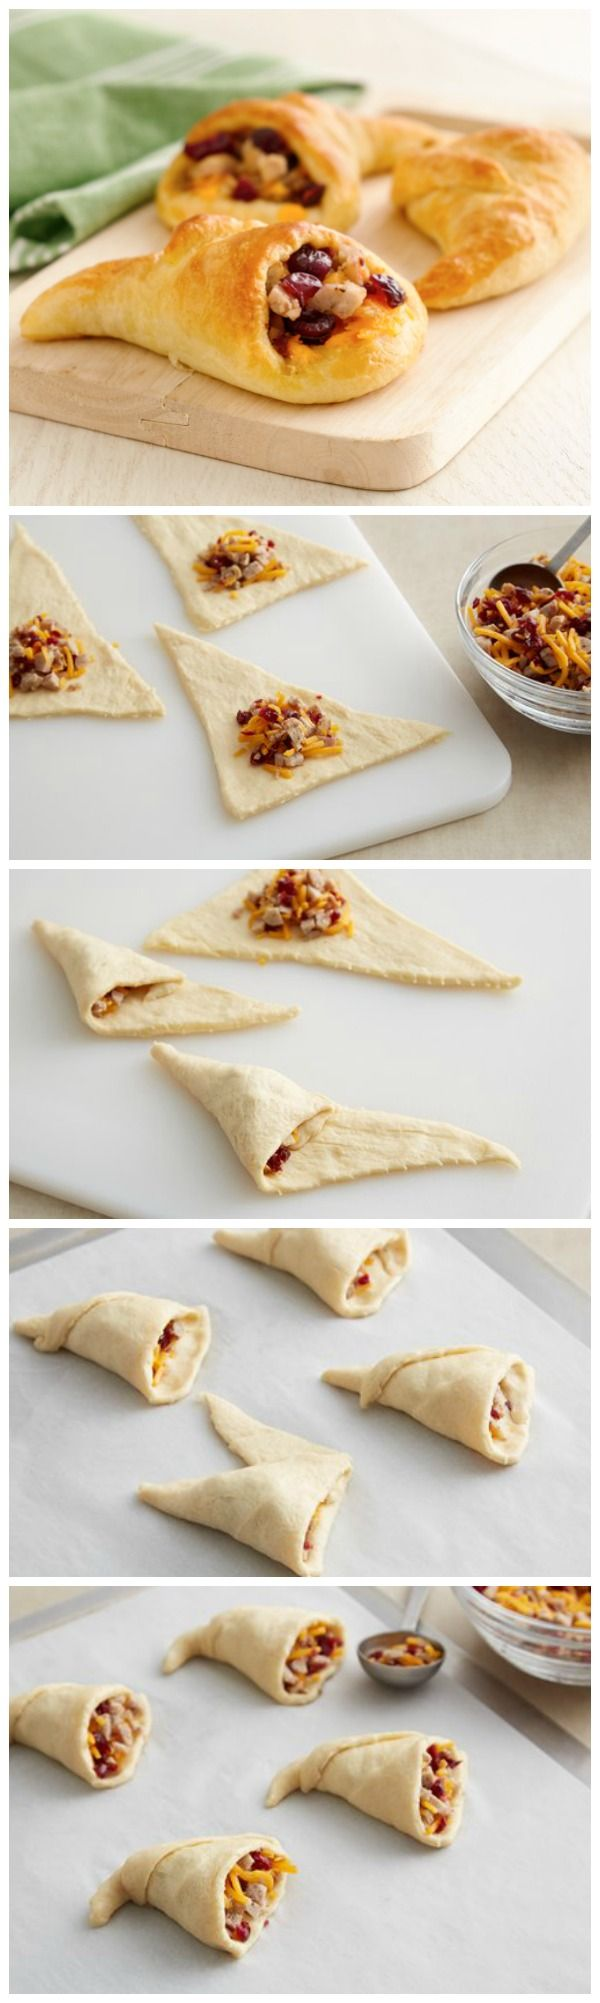 Tasty Food Ideas Turkey Crescent Rolls